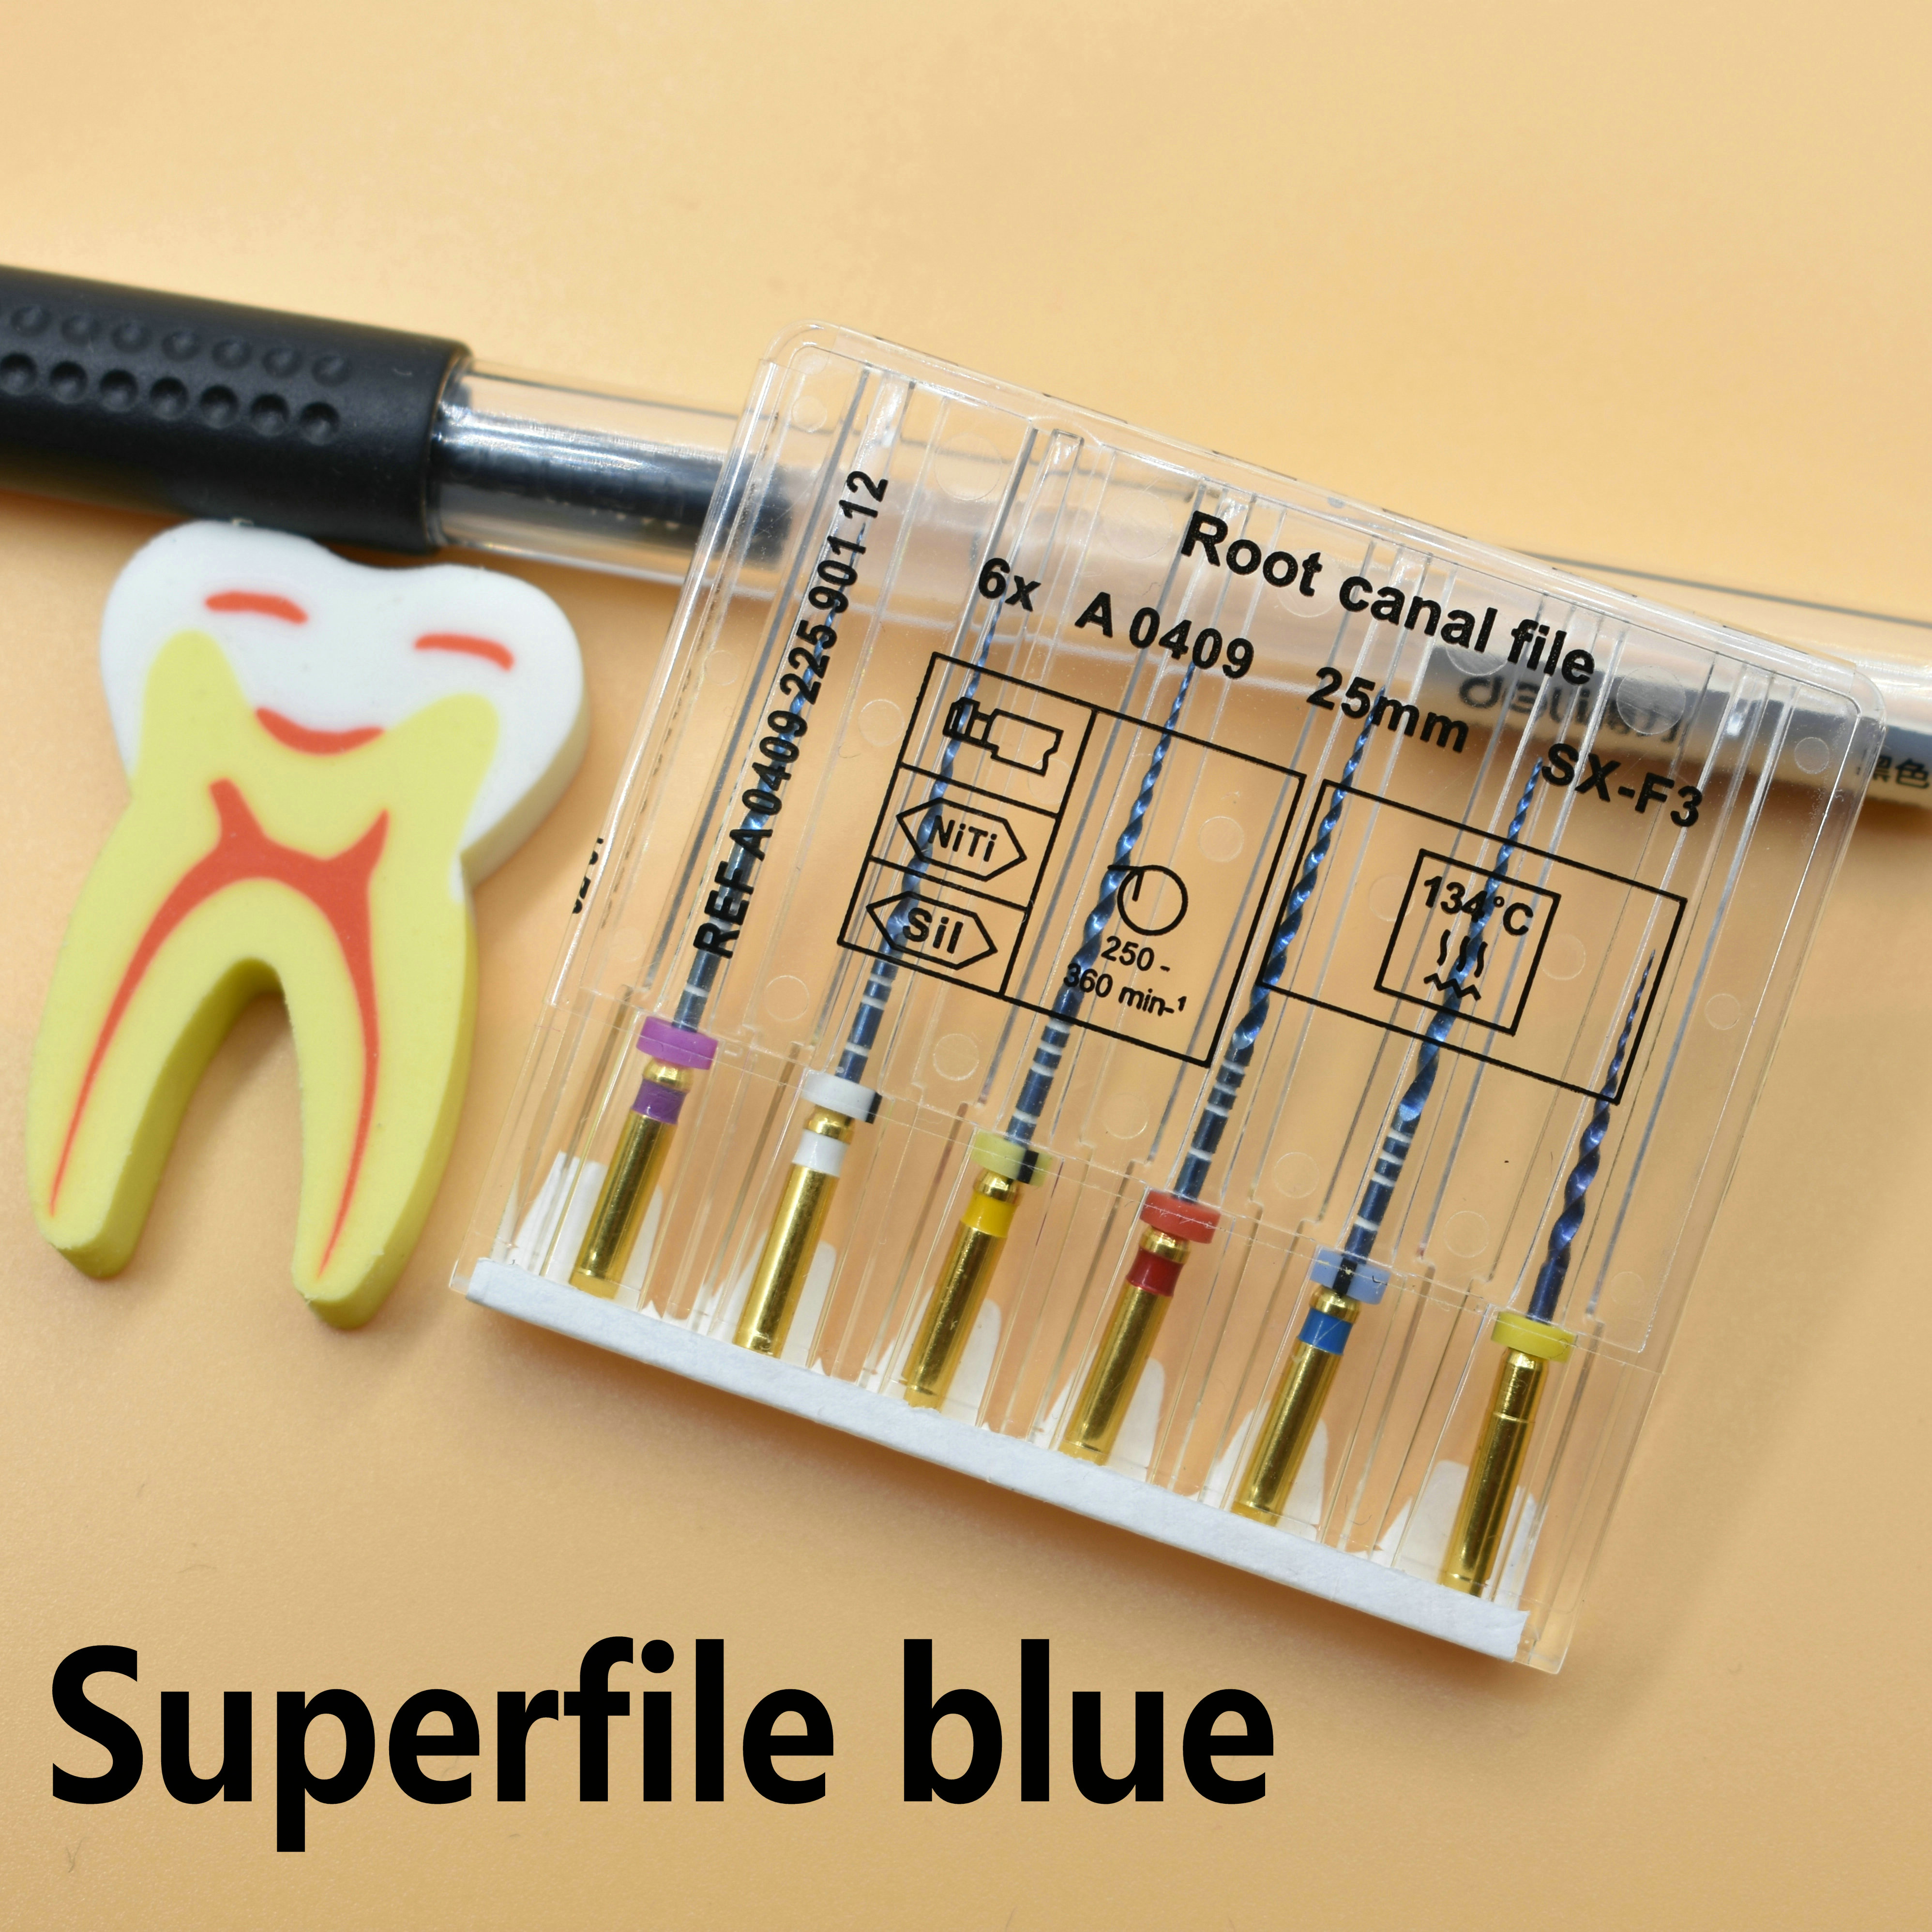 Dental Super Files Blue Flexible Files Endo Rotary   Endodontic Root Canal Files  Nickel Titainium Instrument SX-F3 Dentistry